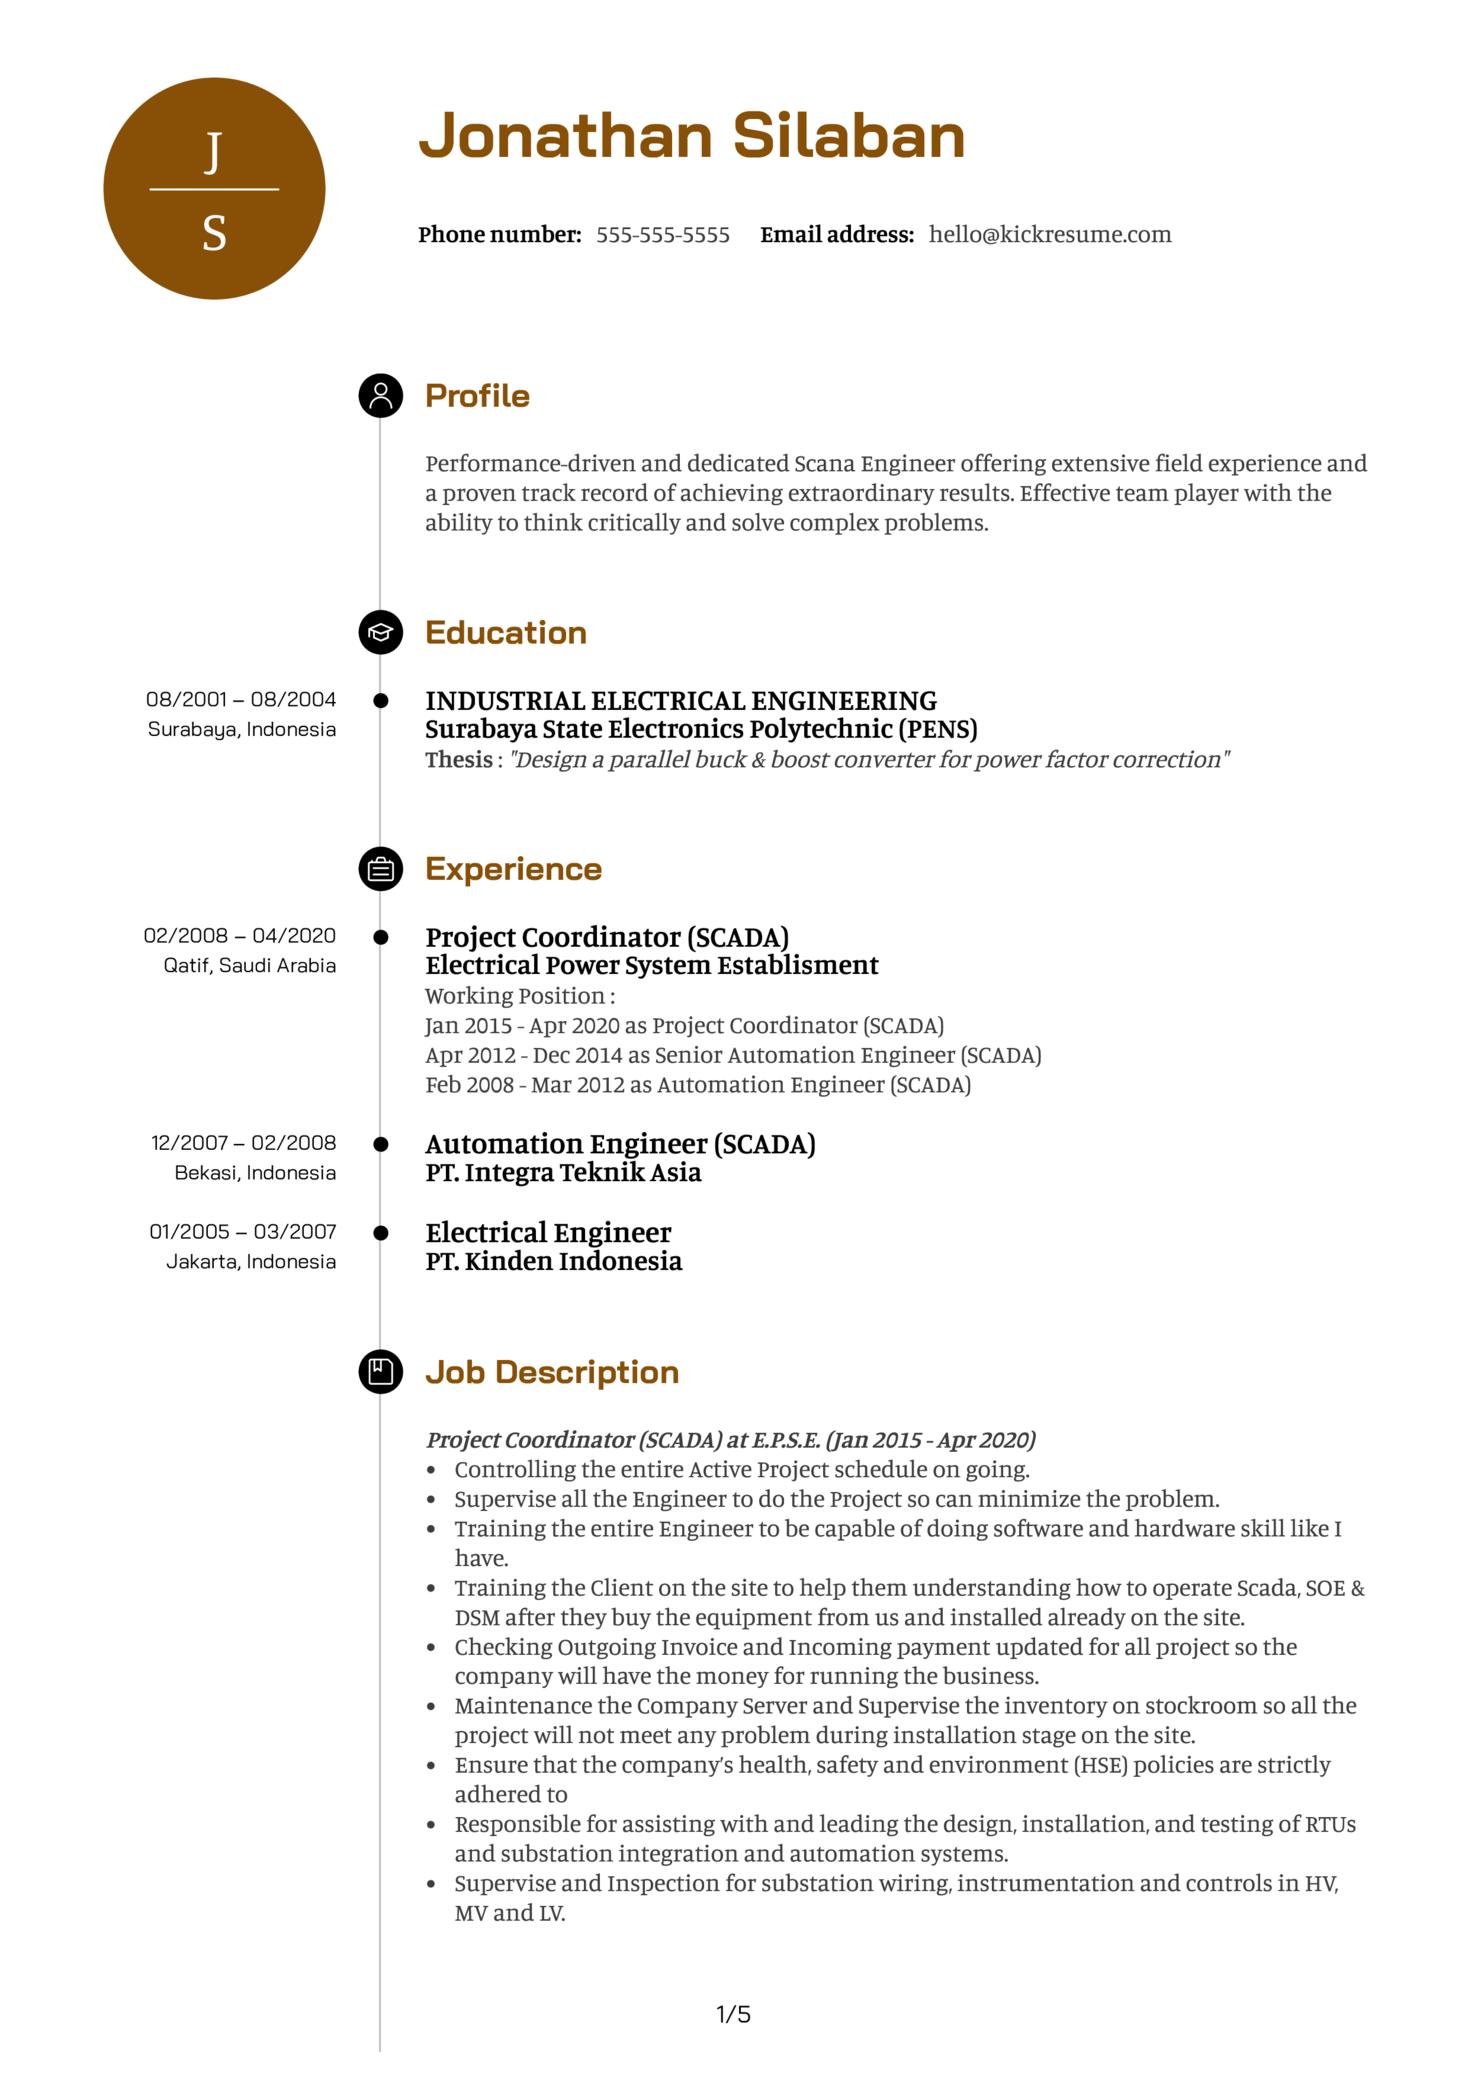 Siemens Scada Engineer Resume Example